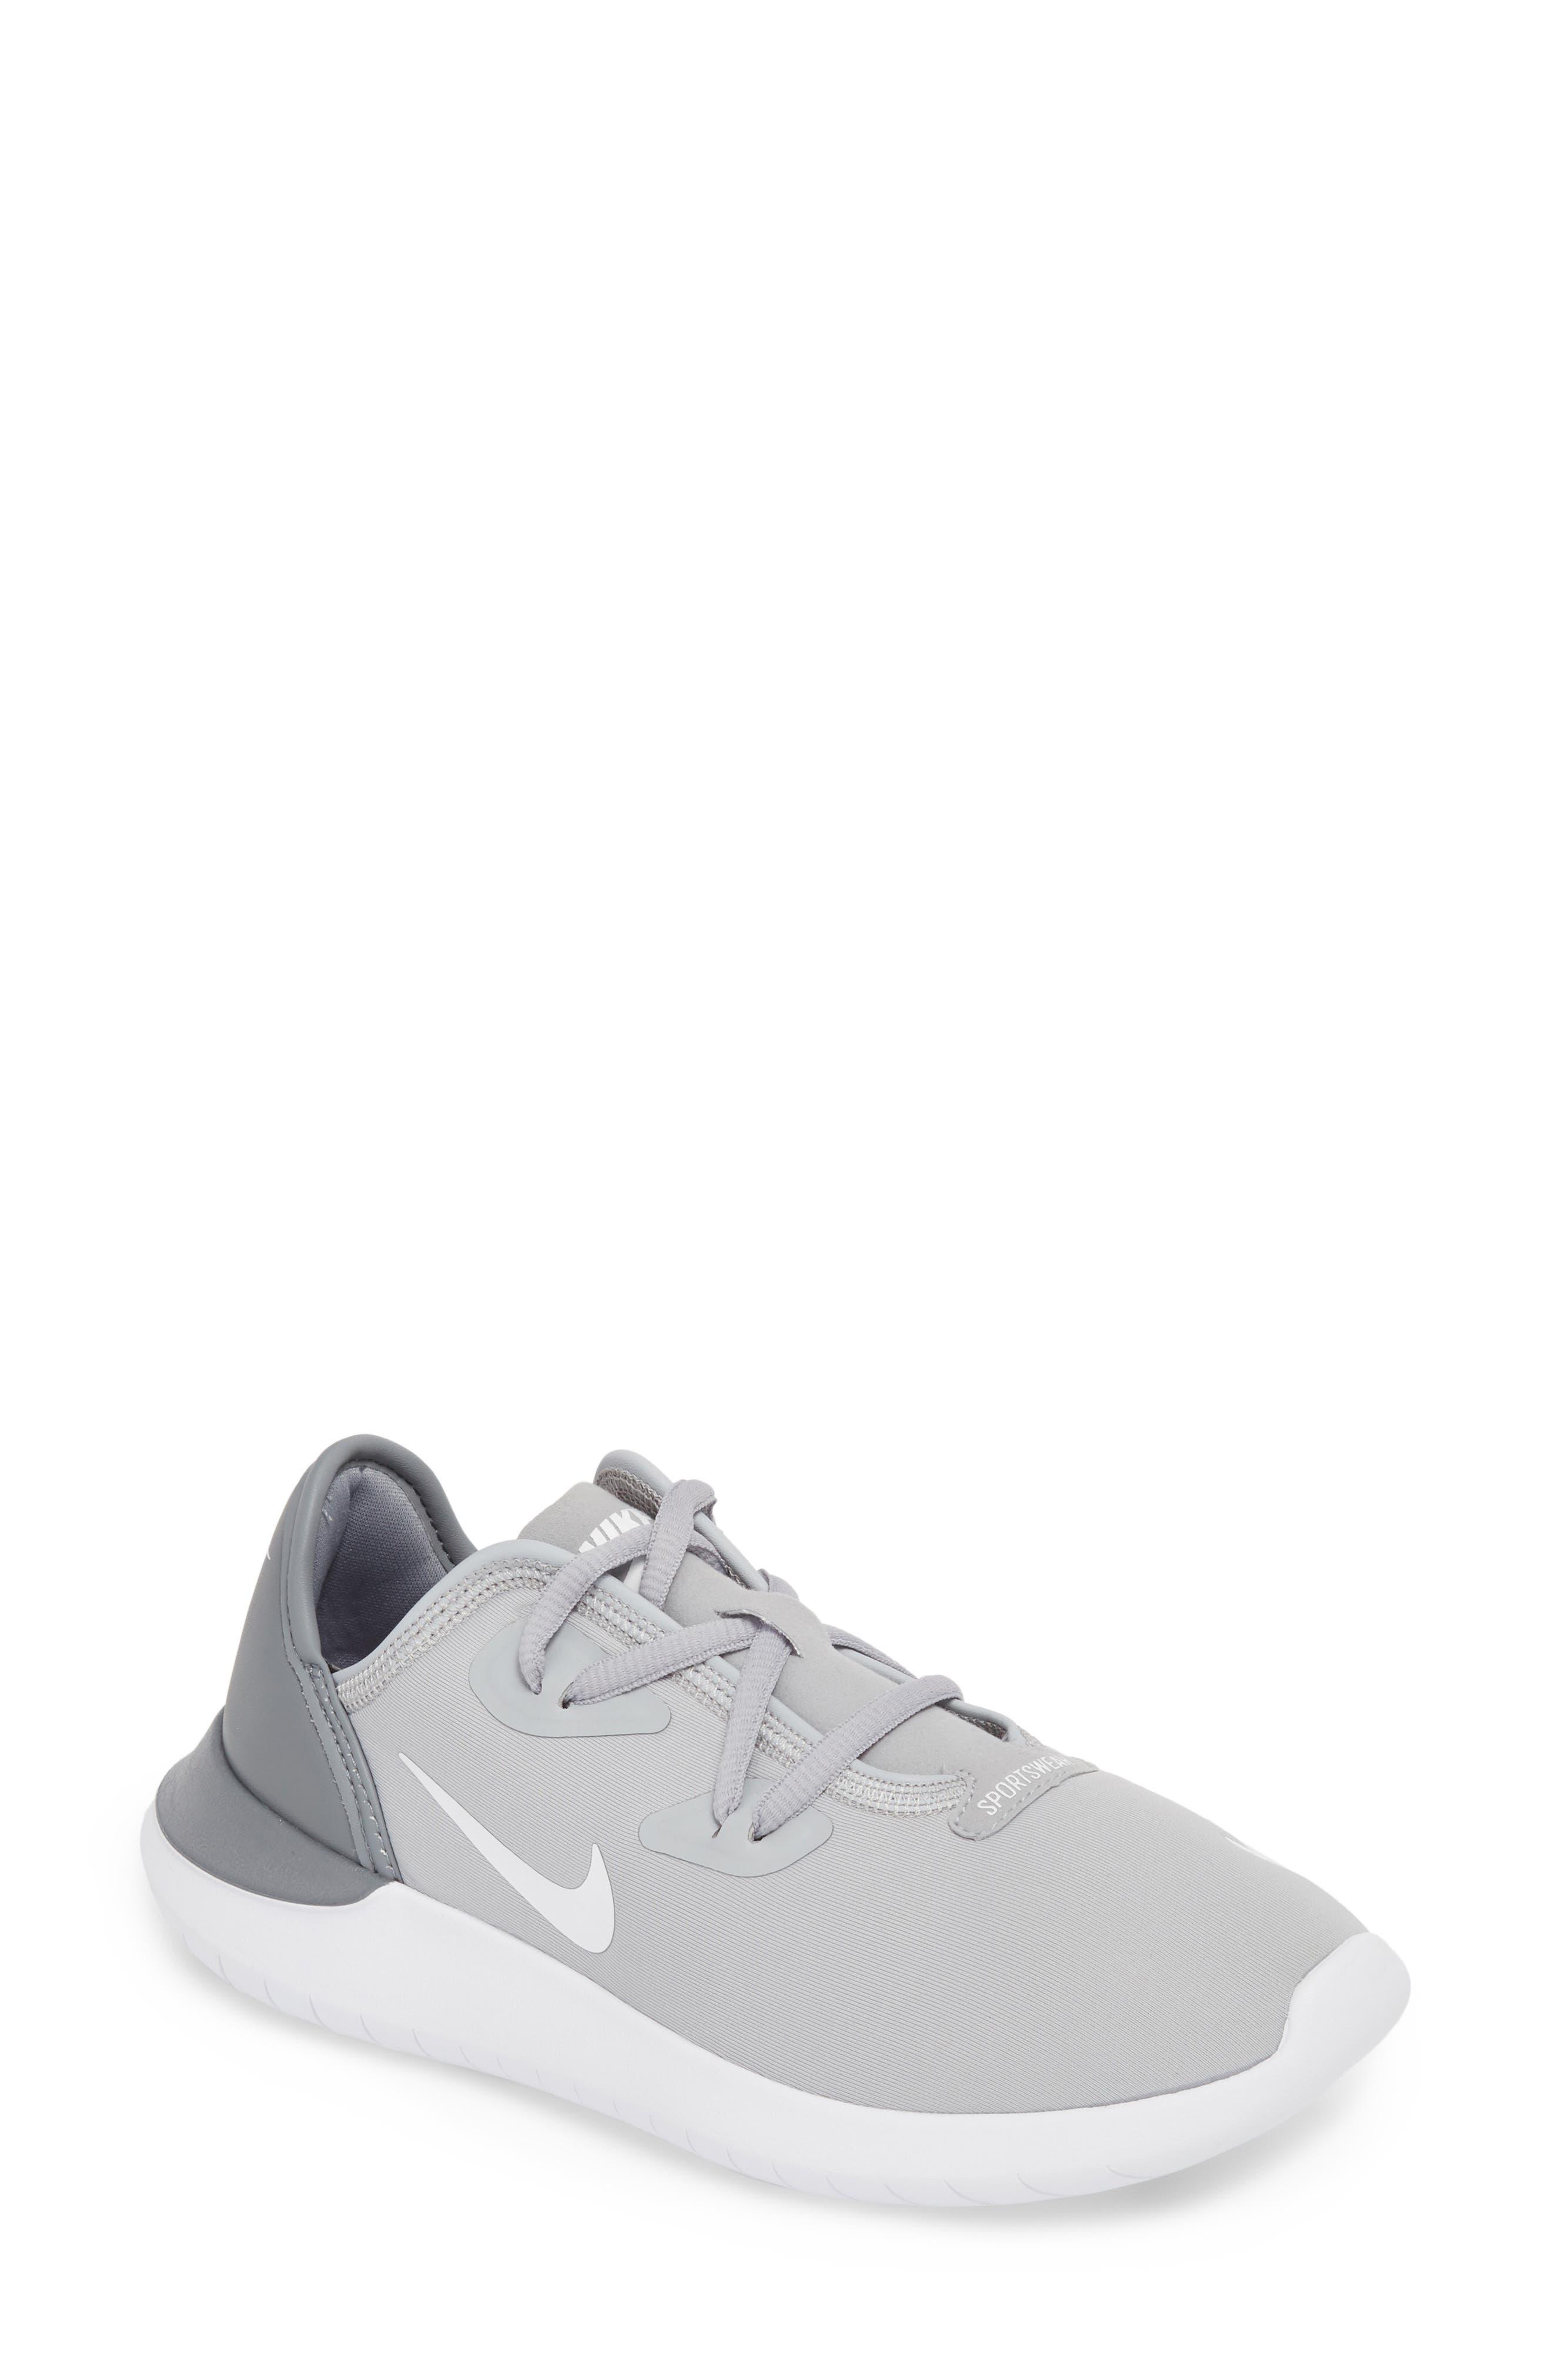 Hakata Sneaker,                             Main thumbnail 1, color,                             Wolf Grey/ White